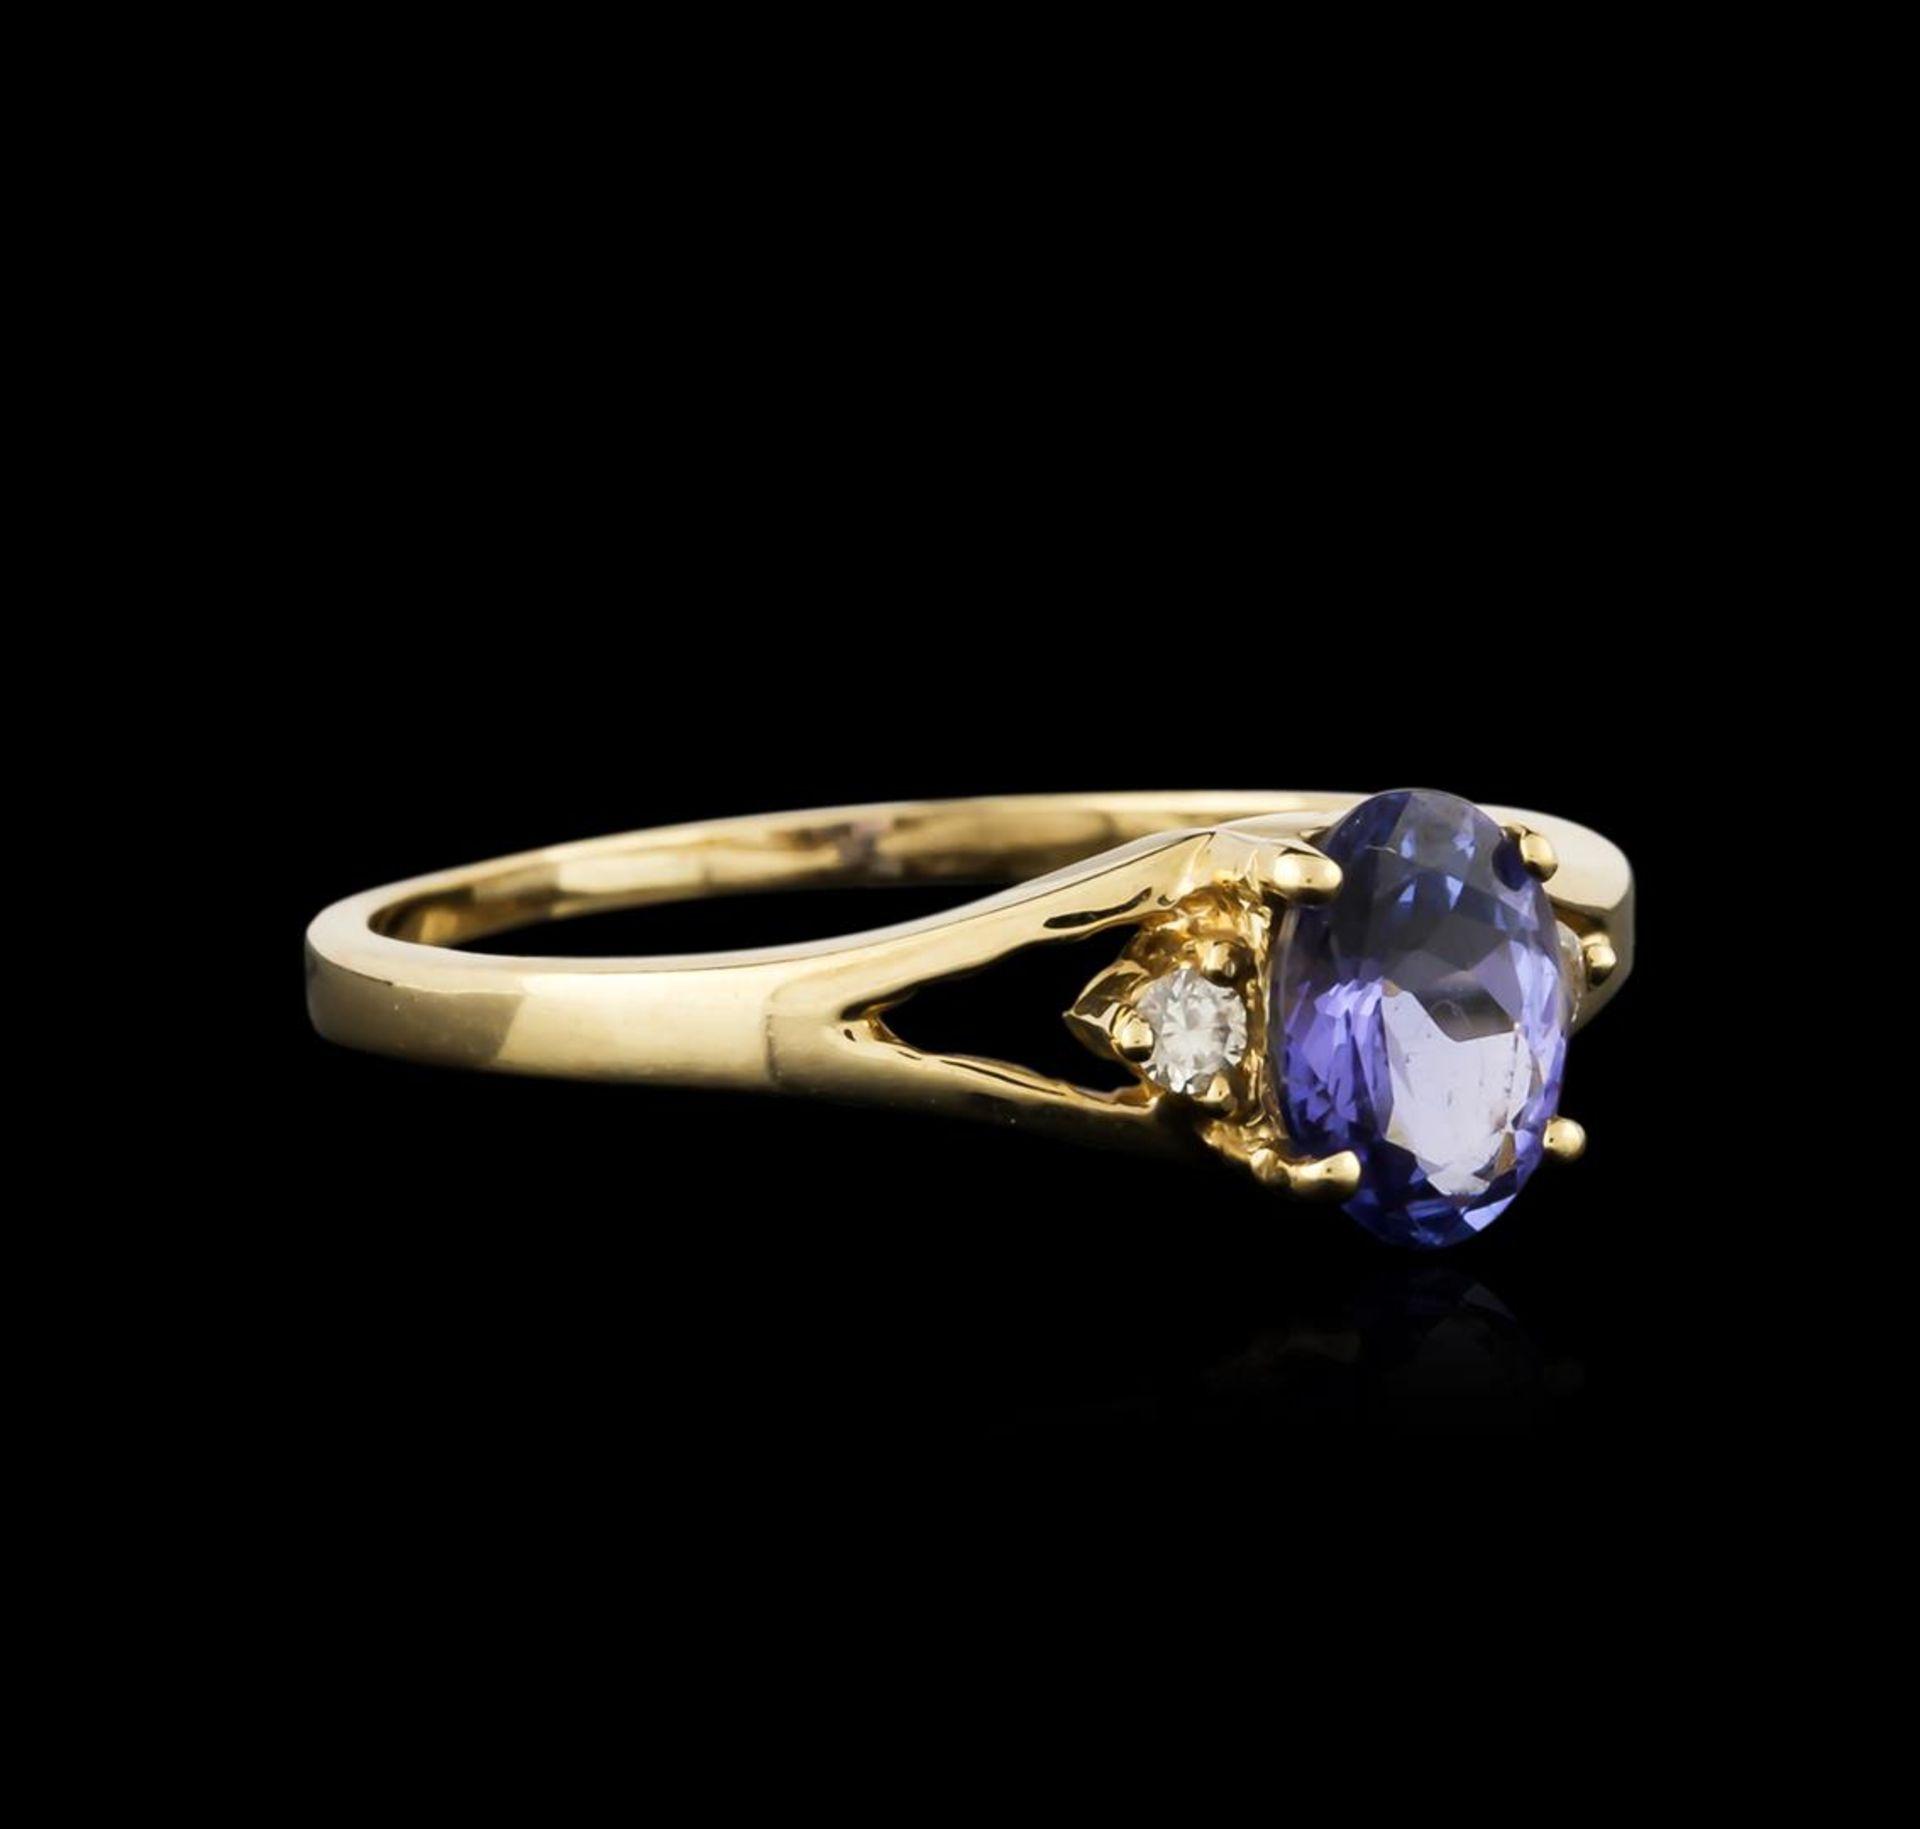 14KT Yellow Gold 0.93 ctw Tanzanite and Diamond Ring - Image 2 of 3